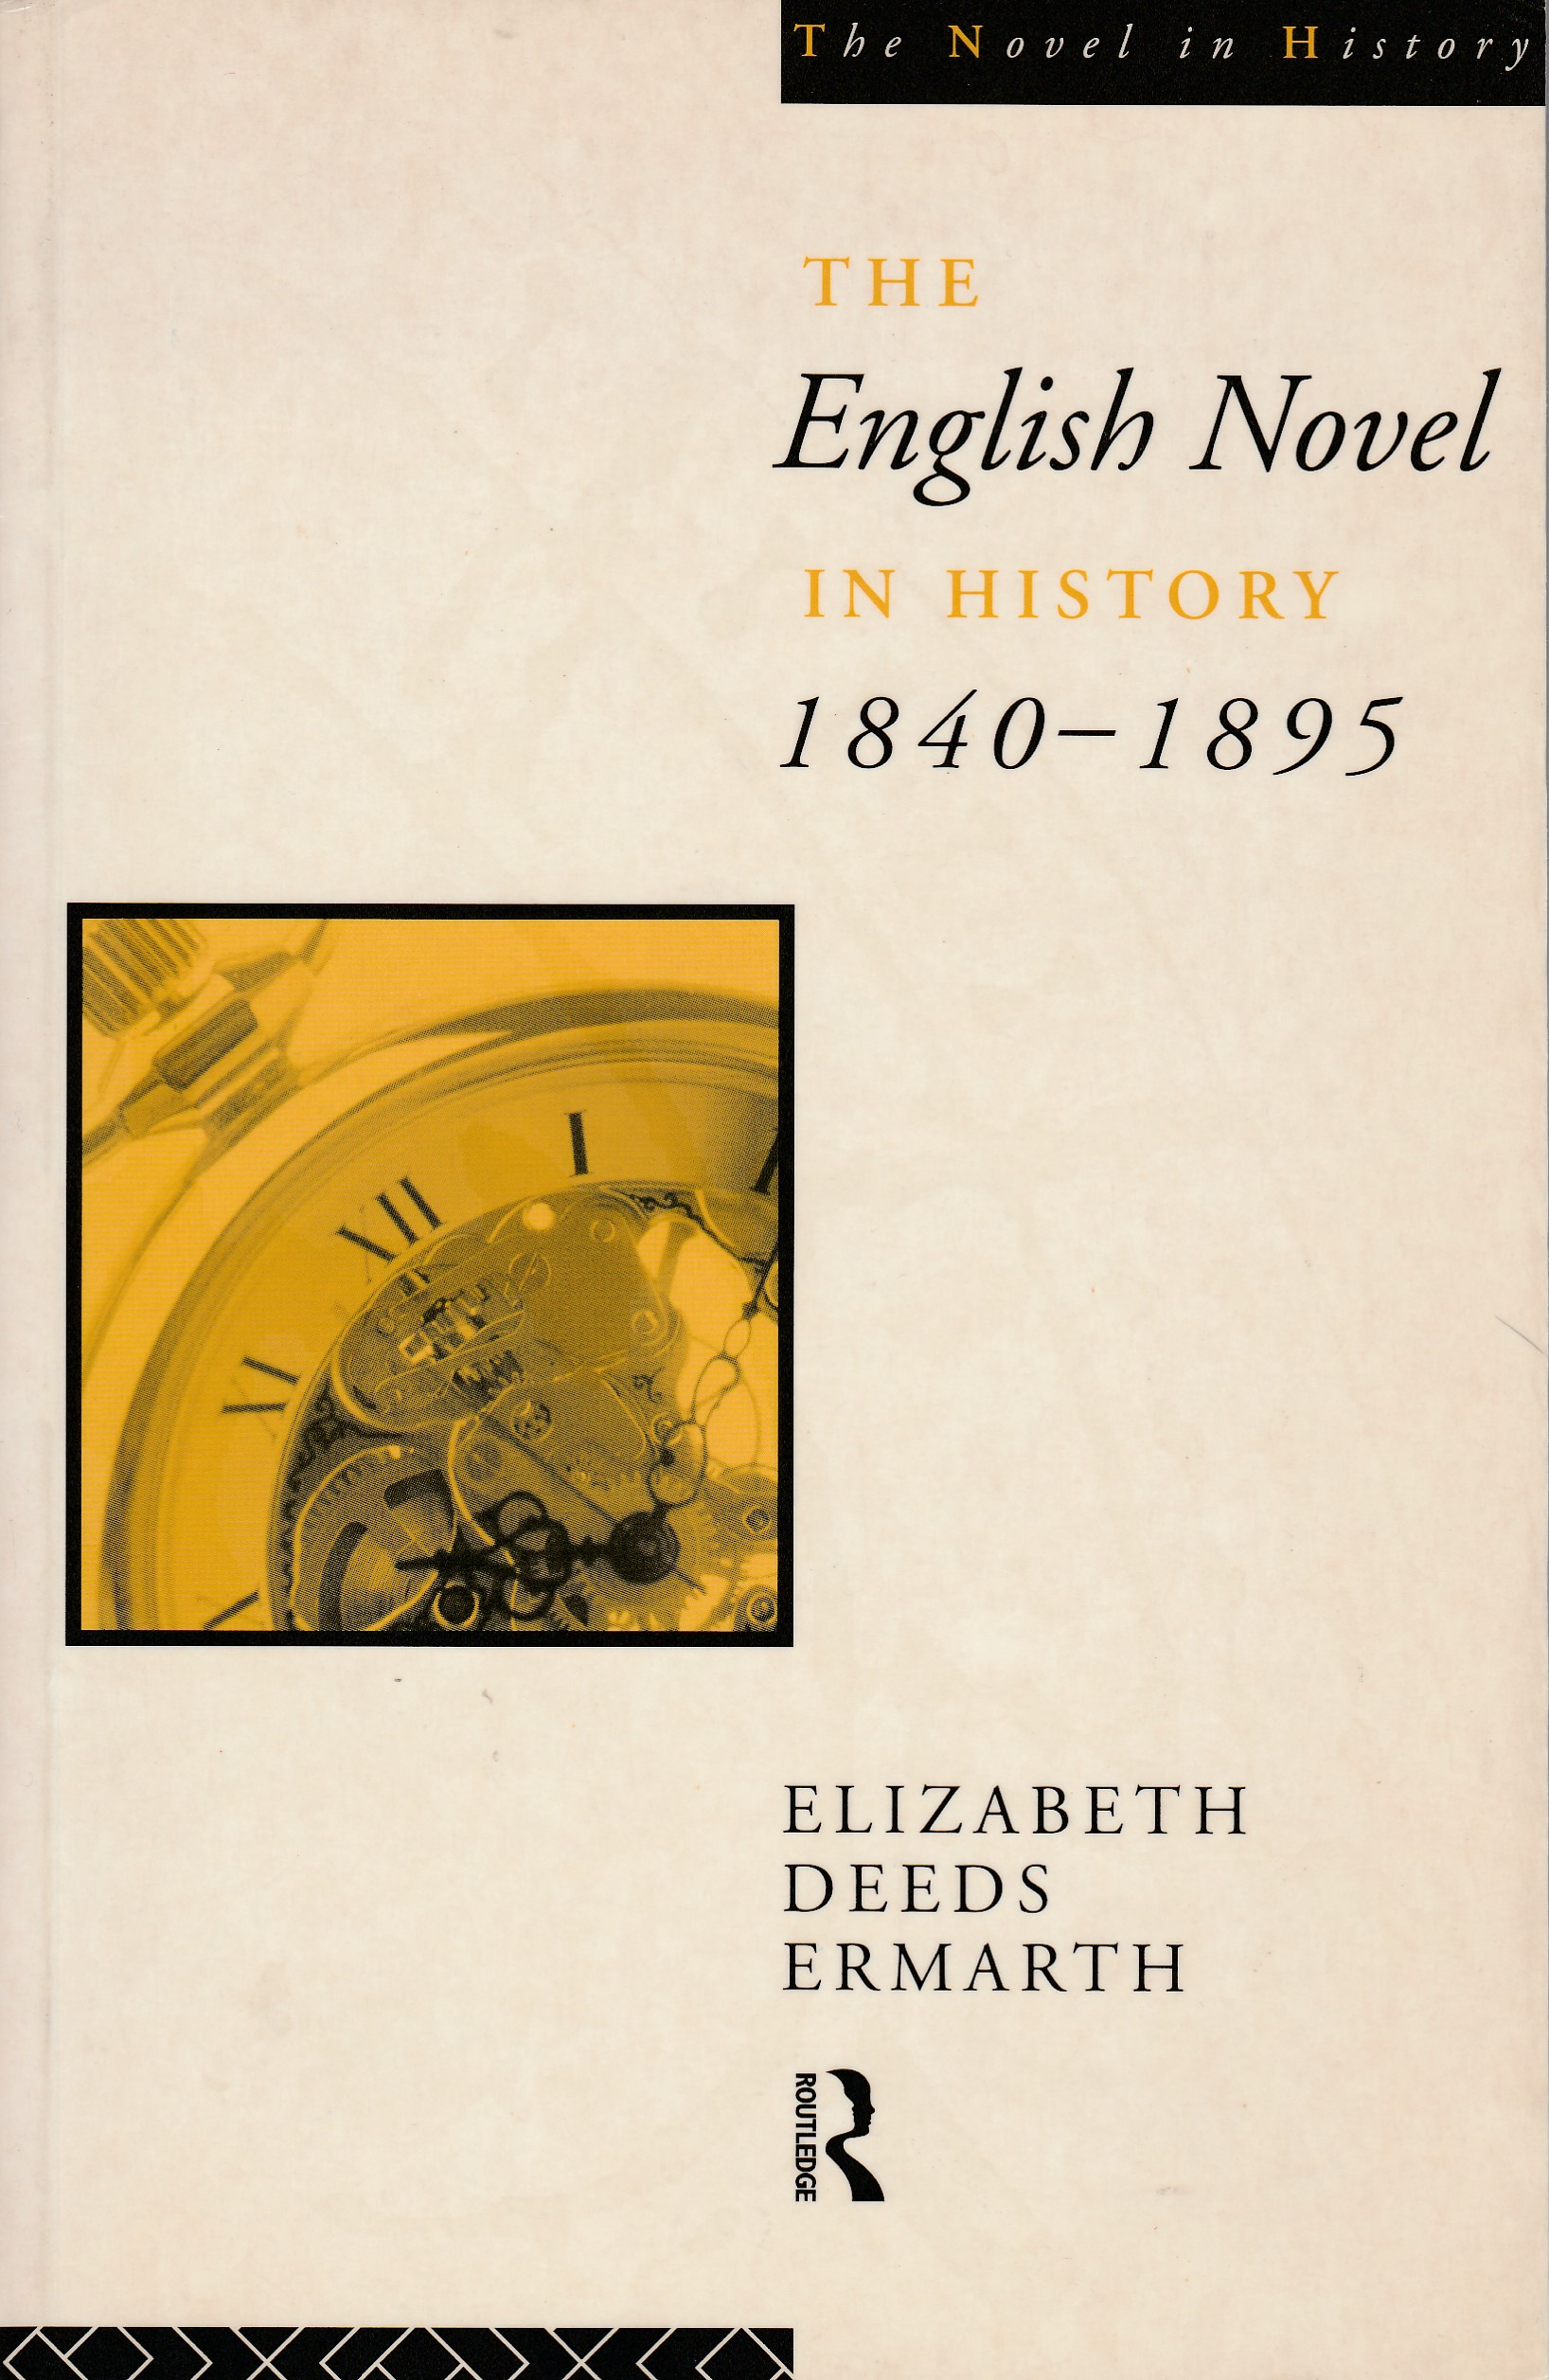 The English Novel in History, 1840-1895